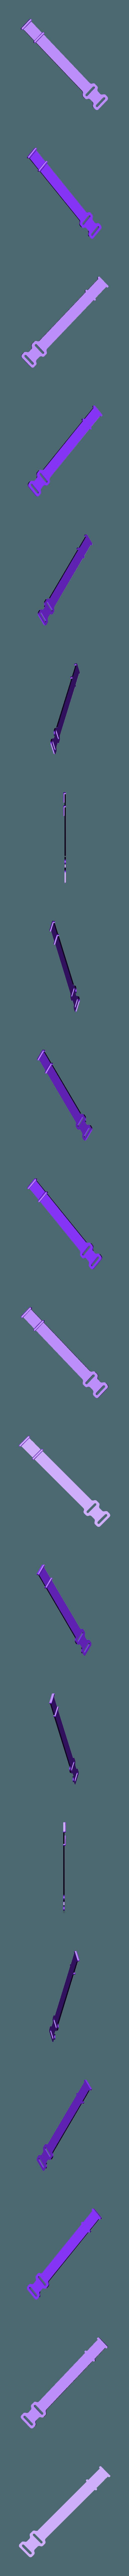 wctm-strap-loop.stl Download free STL file Wearable Temperature Monitor • 3D printing object, Adafruit